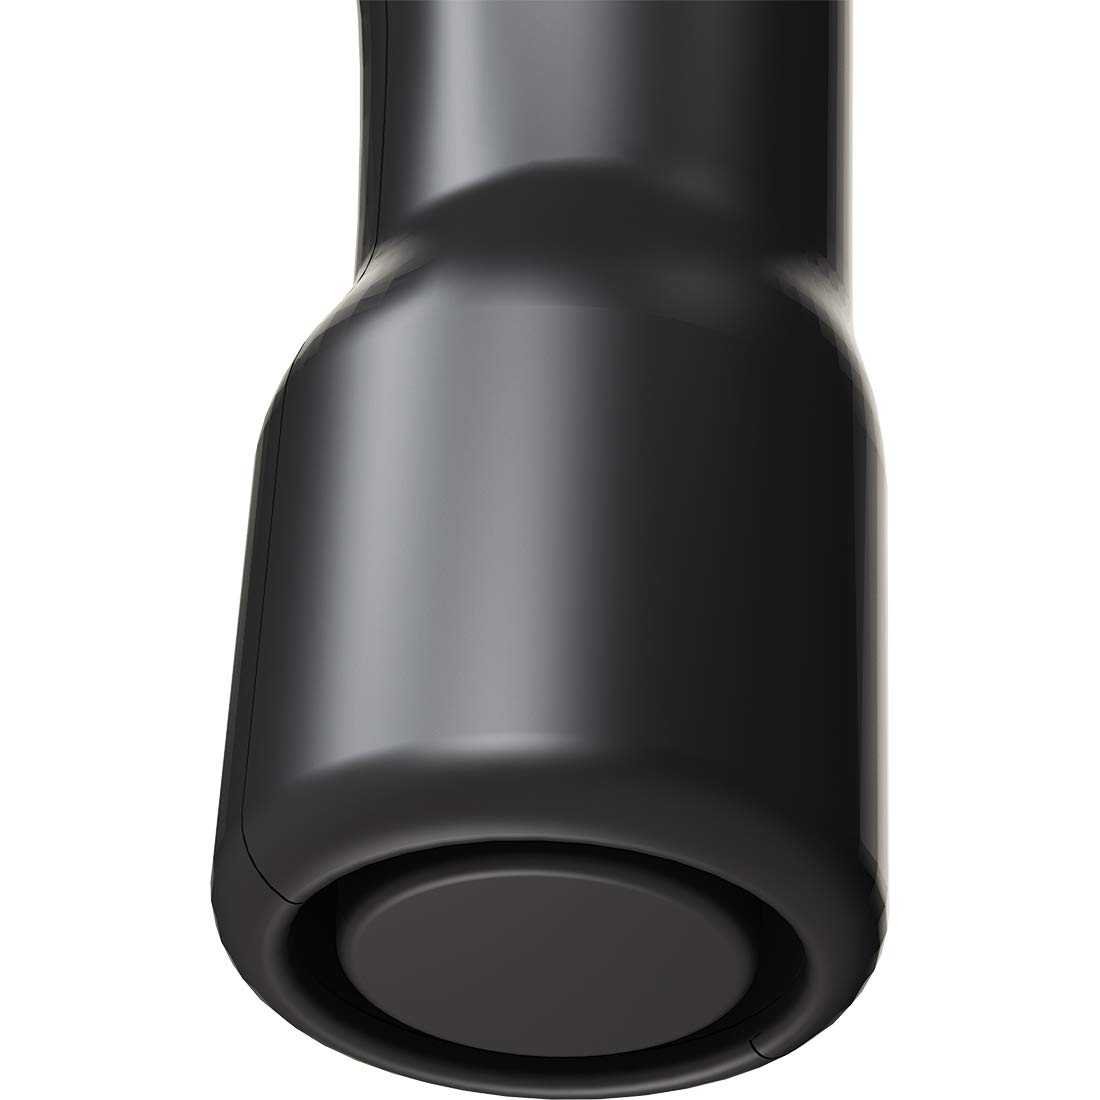 Plegium Smart Pepper Spray - Self Defense Pepper Spray For Women, The First Pepper Spray For Personal Defense With Emergency Location Text Messages, Phone Calls, Built-in Siren & Strobe Lights (Black) by Plegium (Image #10)